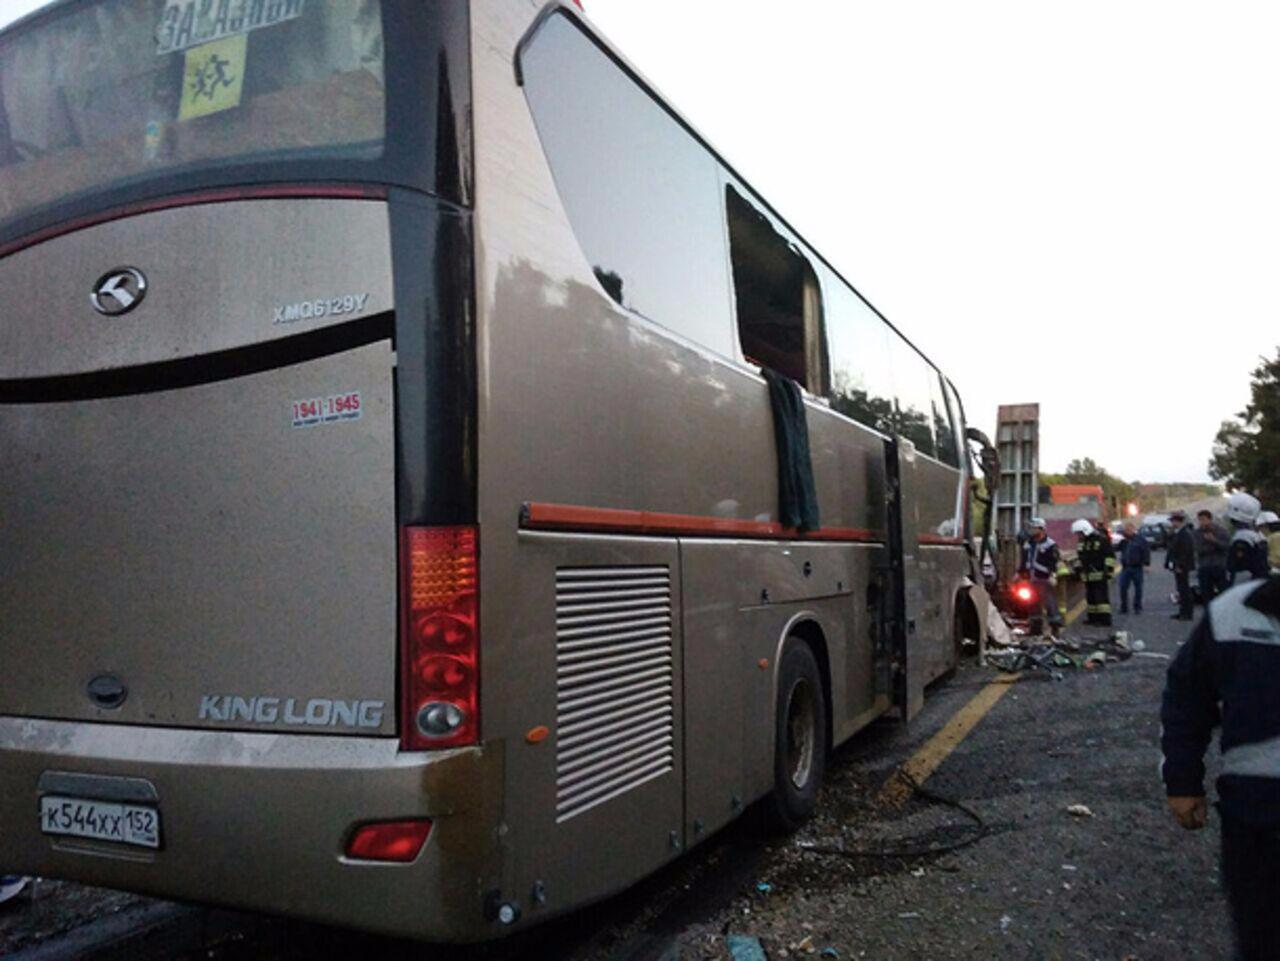 Ужасное ДТП наКубани: шофёр автобуса мог заснуть зарулем